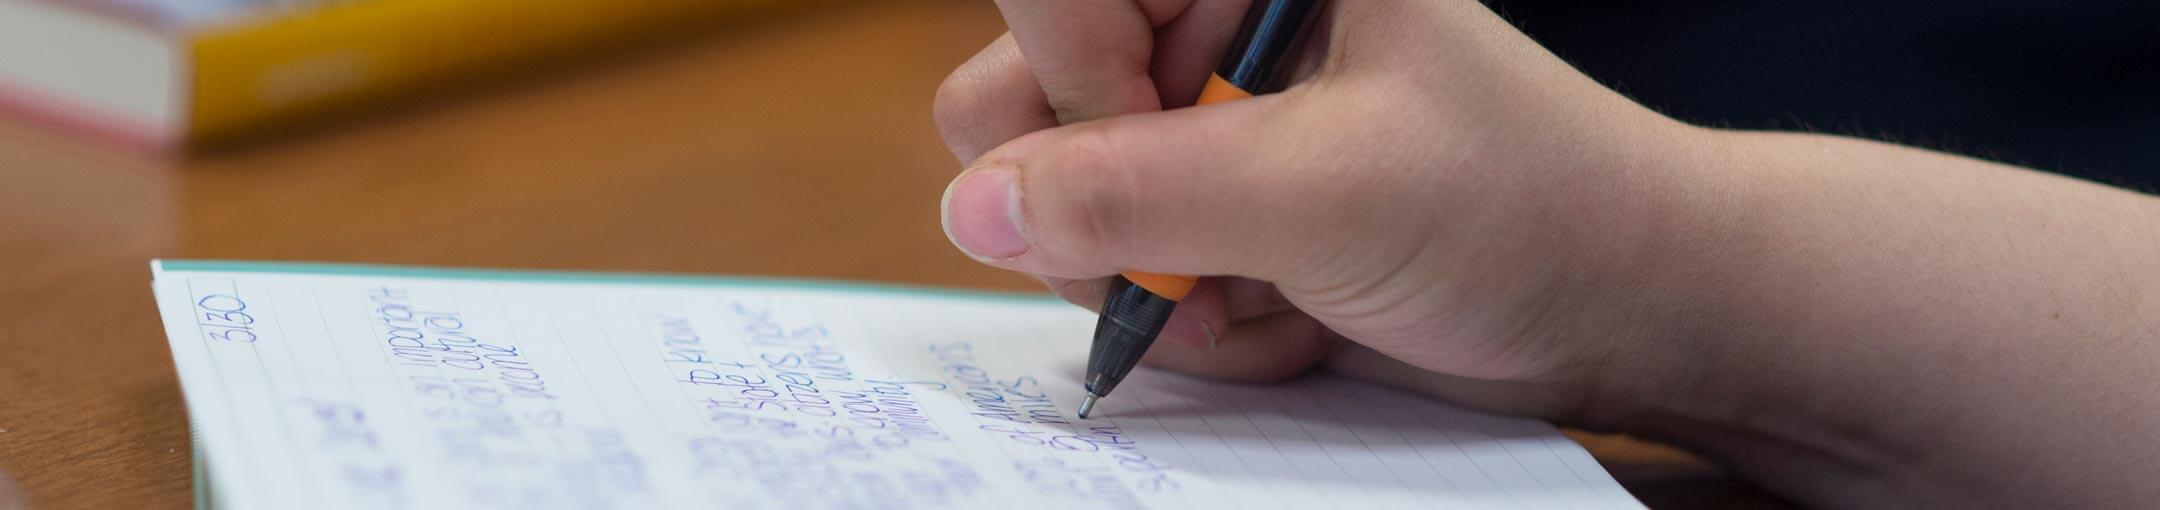 Hand holding pen writes on lined paper on desk.